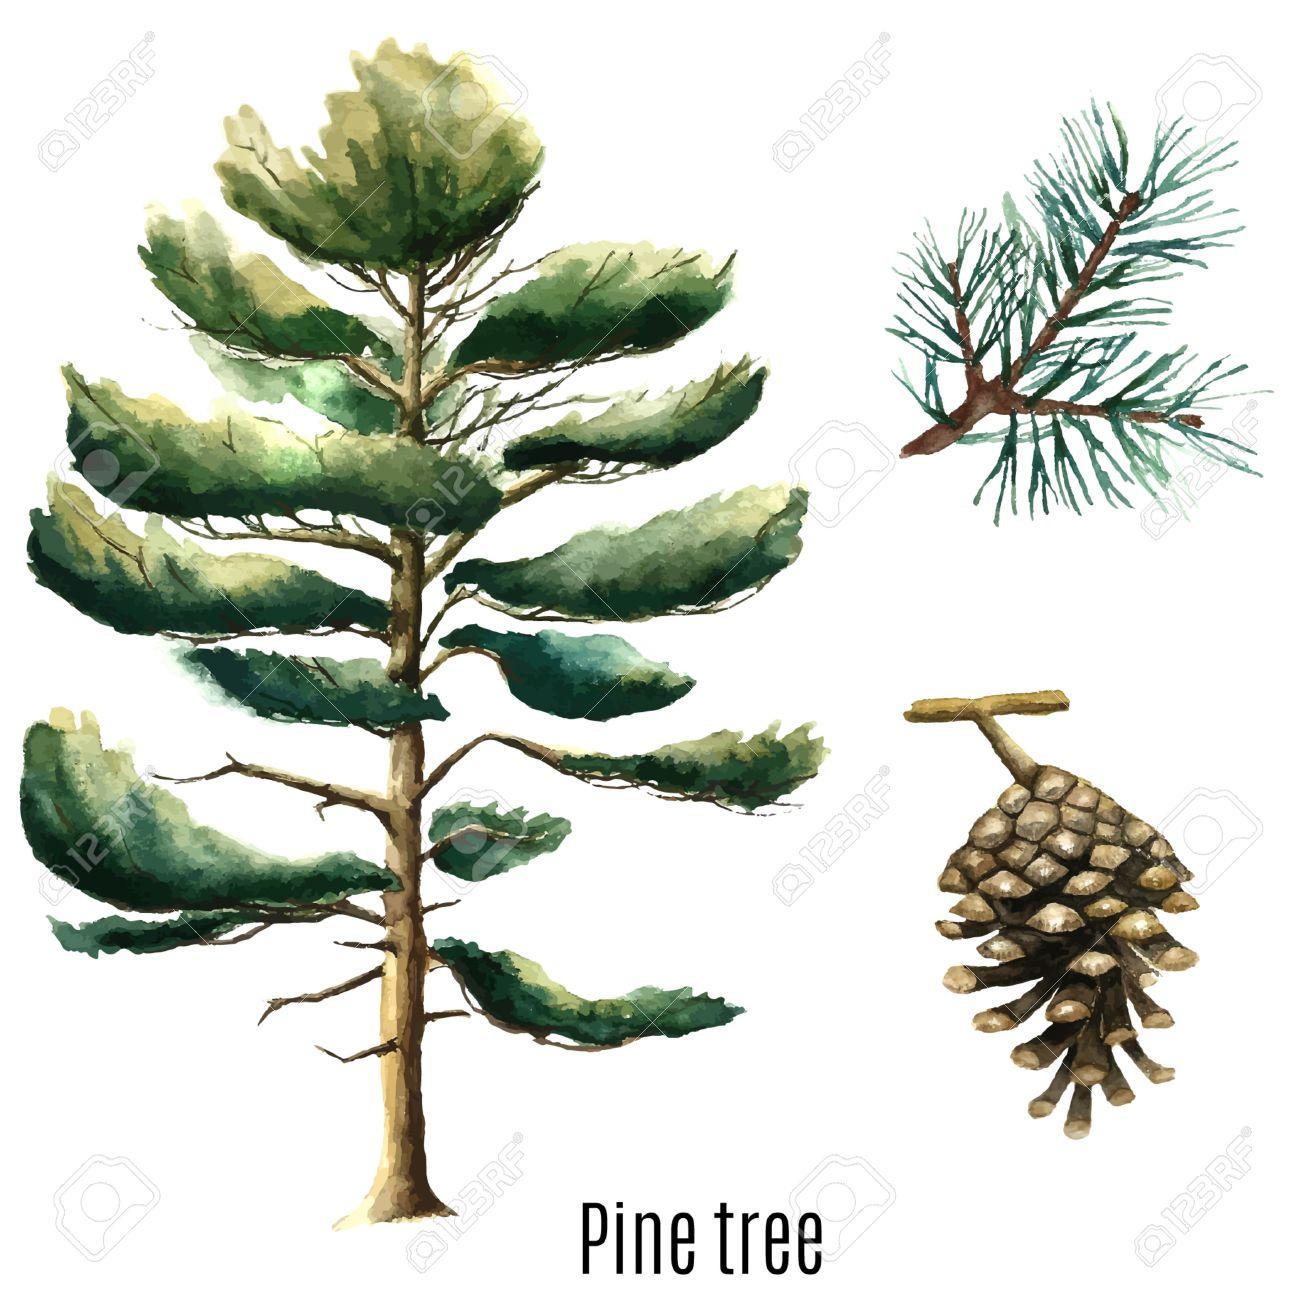 Pine tree watercolor. Vector illustration. - 58721093